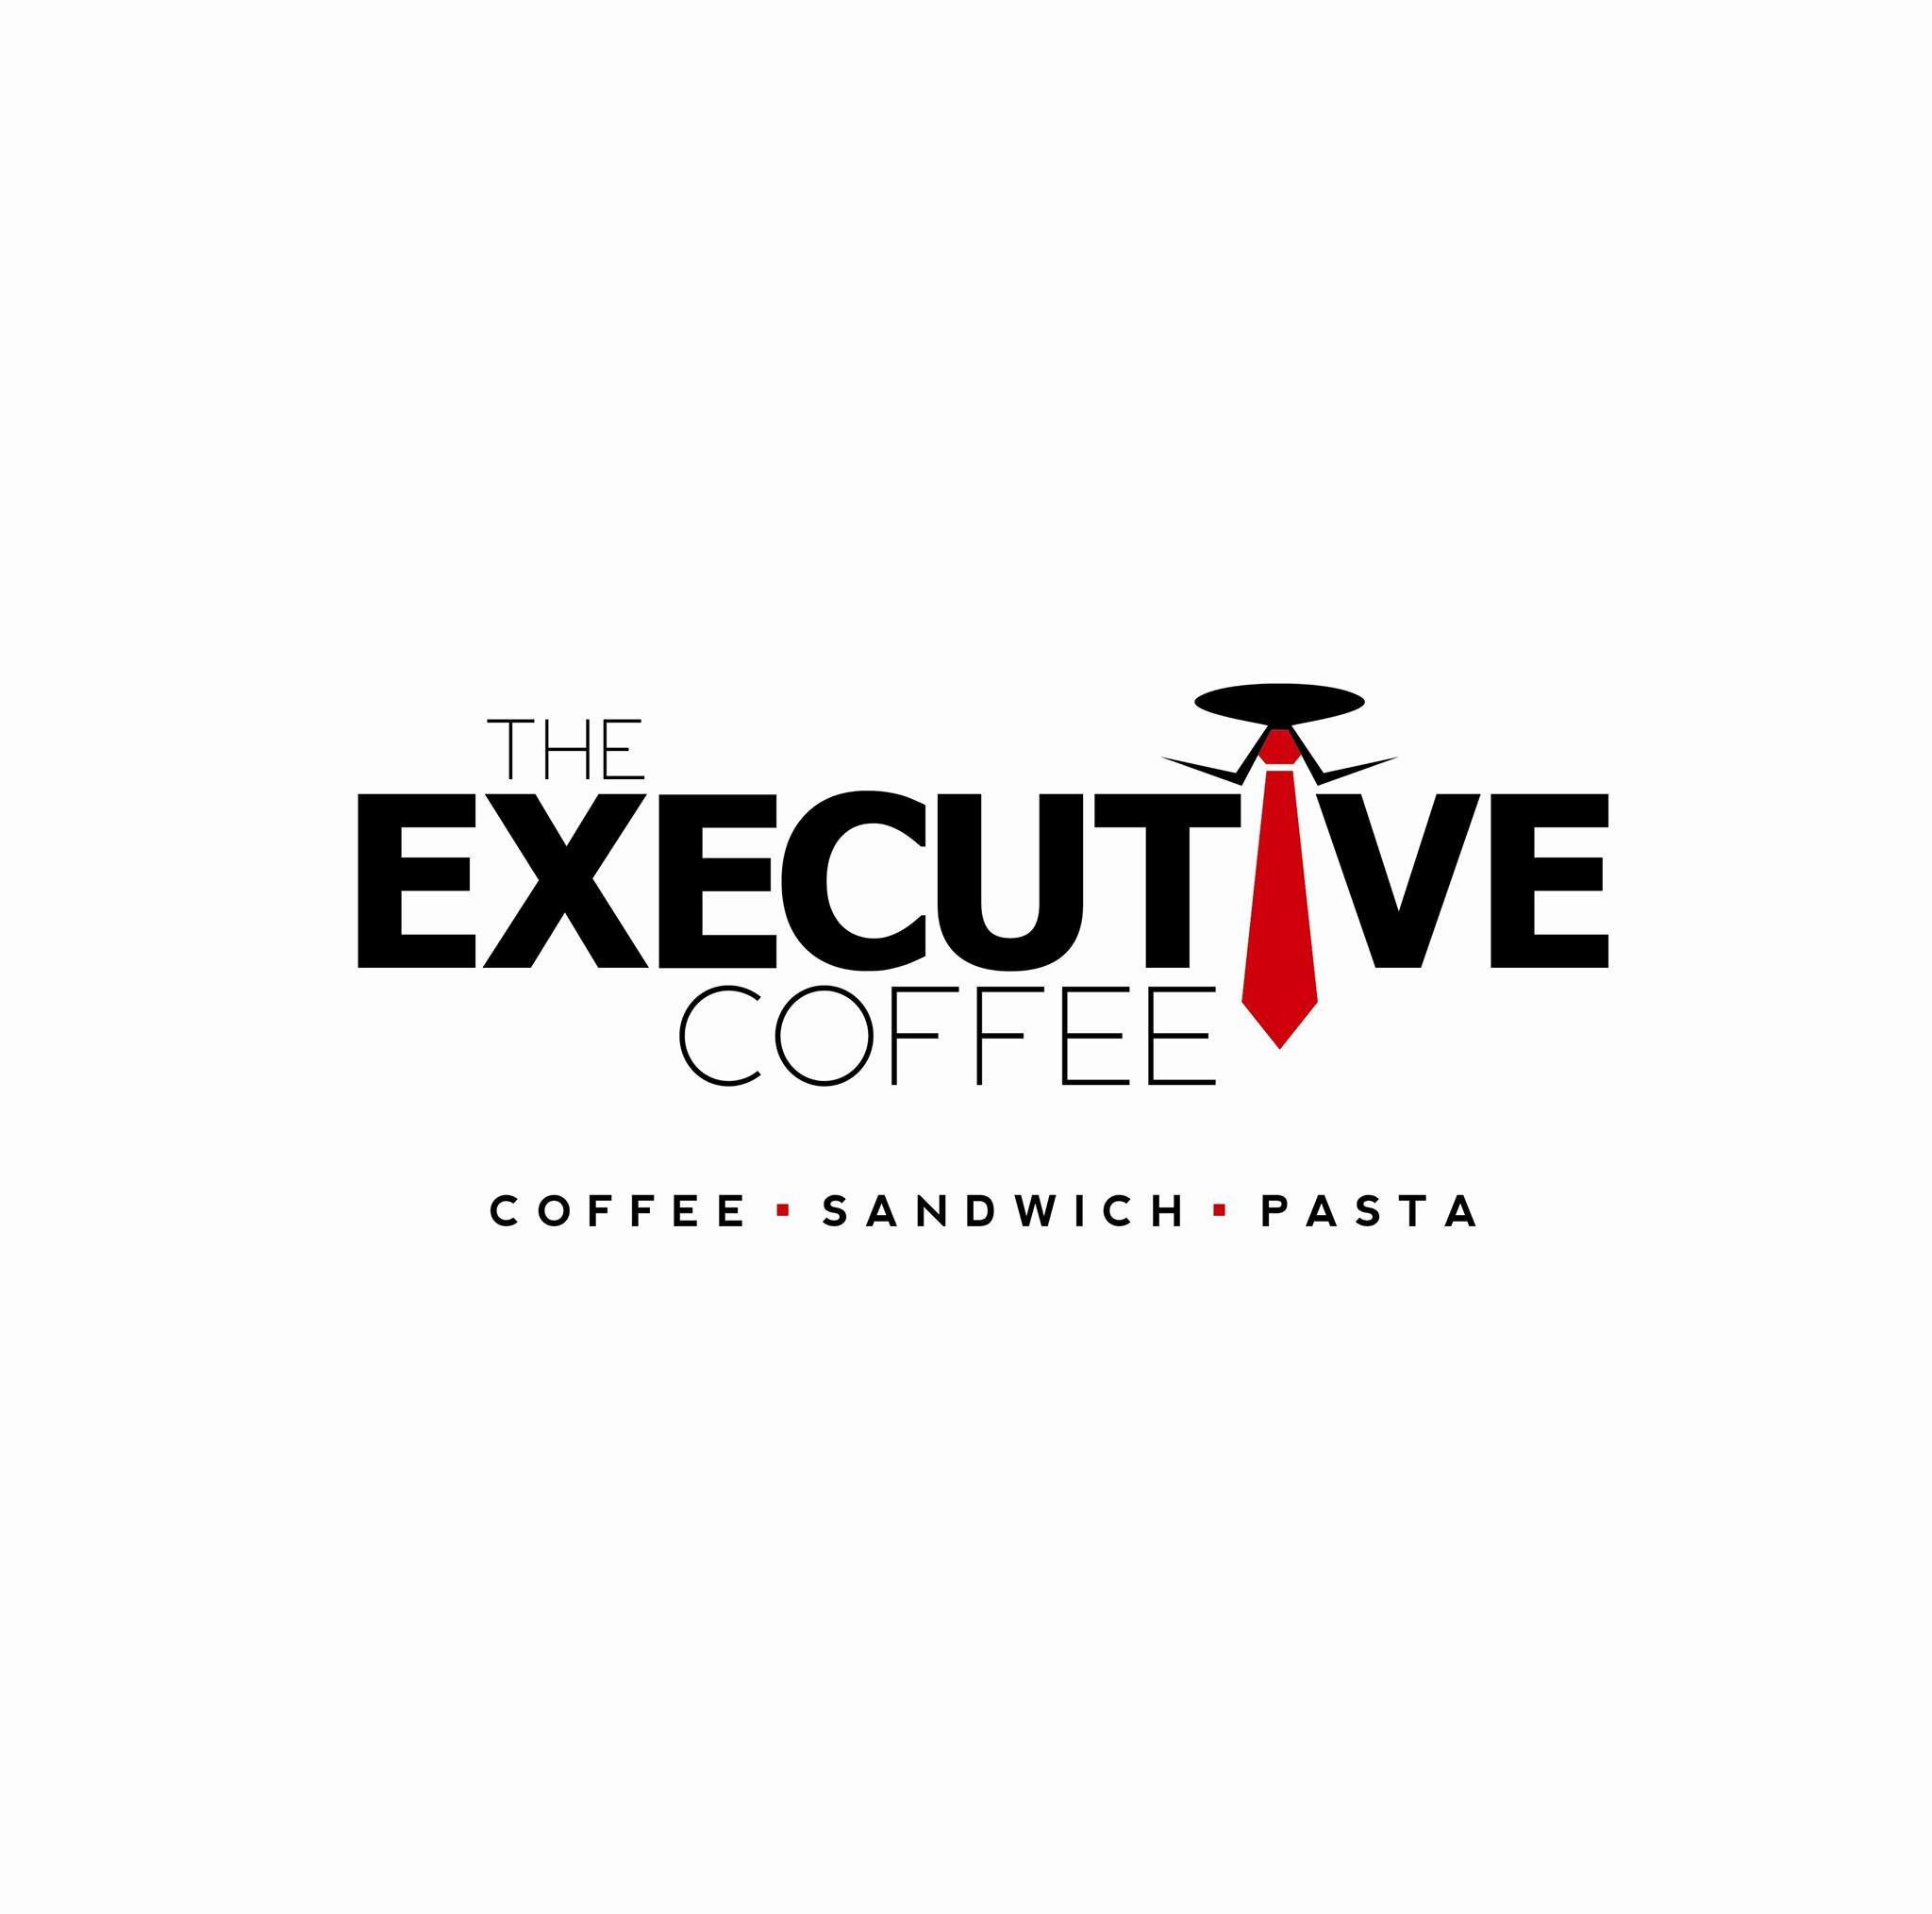 THE EXECUTIVE COFFEE